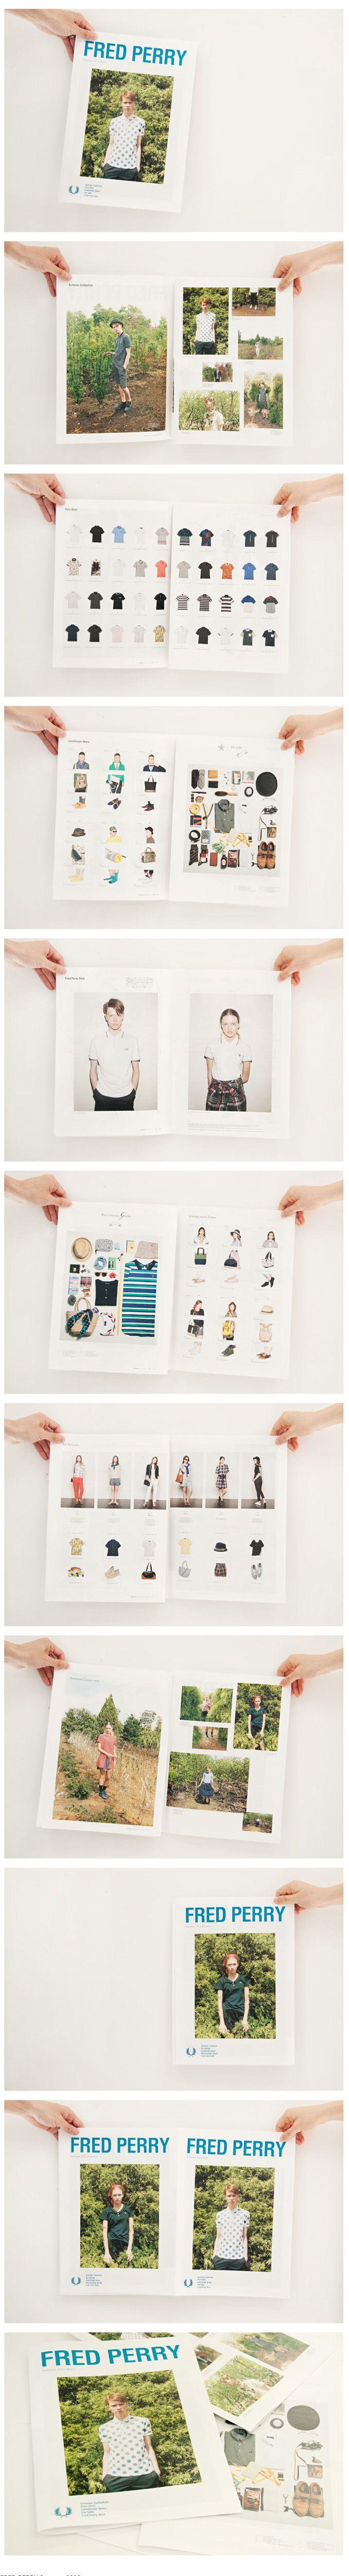 #editorialdesign #layoutinspiration #typography